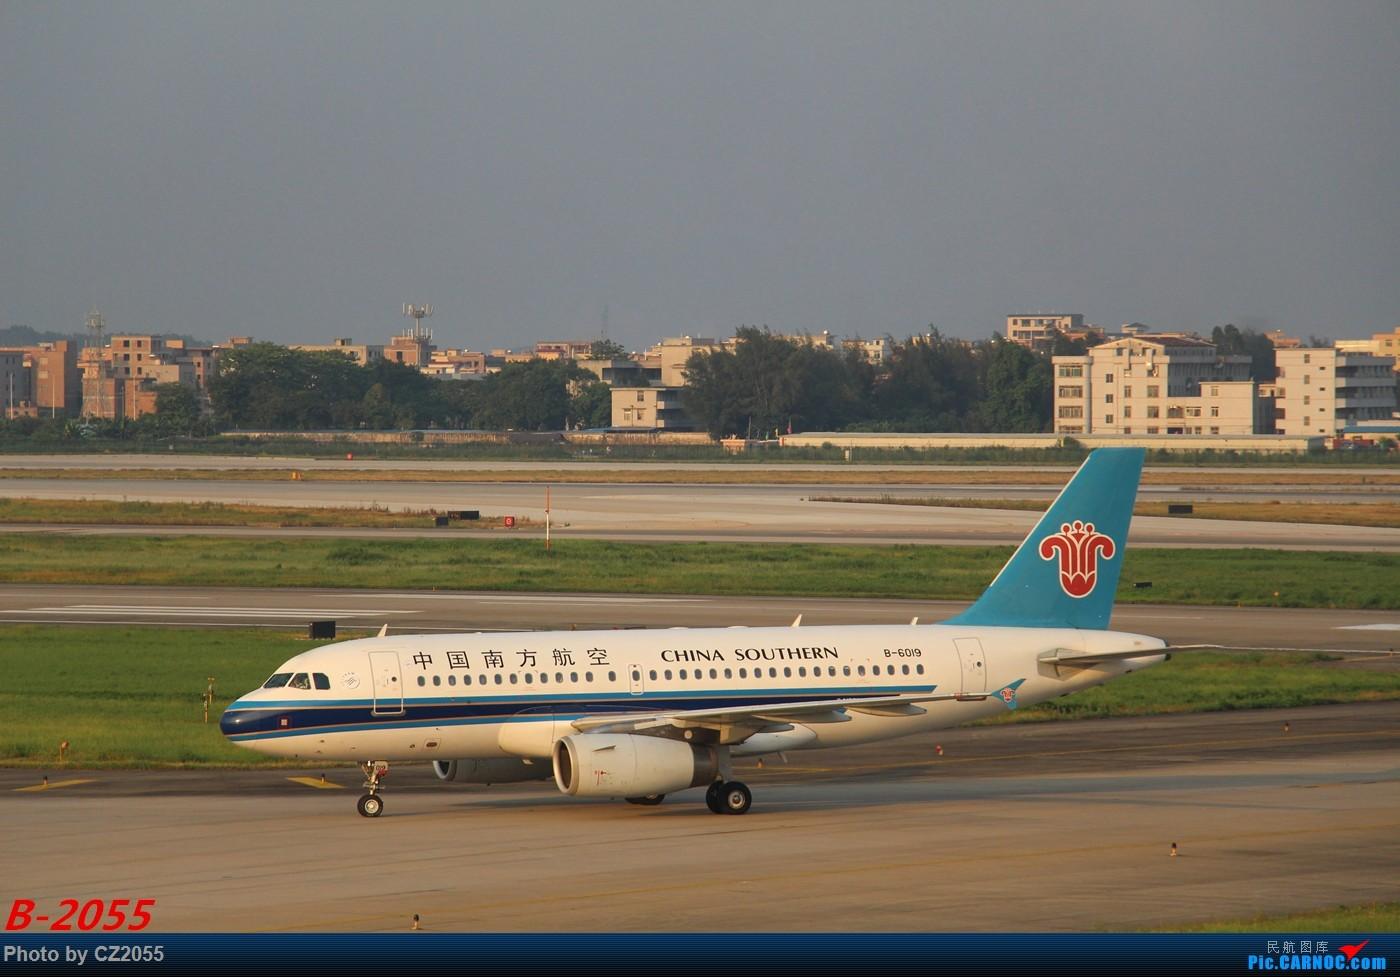 Re:[原创]Re:[原创]【广东青少年拍机小队】【C-Z-2055】发完737和宽体就升级320,那就再发一组320系列。 AIRBUS A319-100 B-6019 中国广州白云国际机场